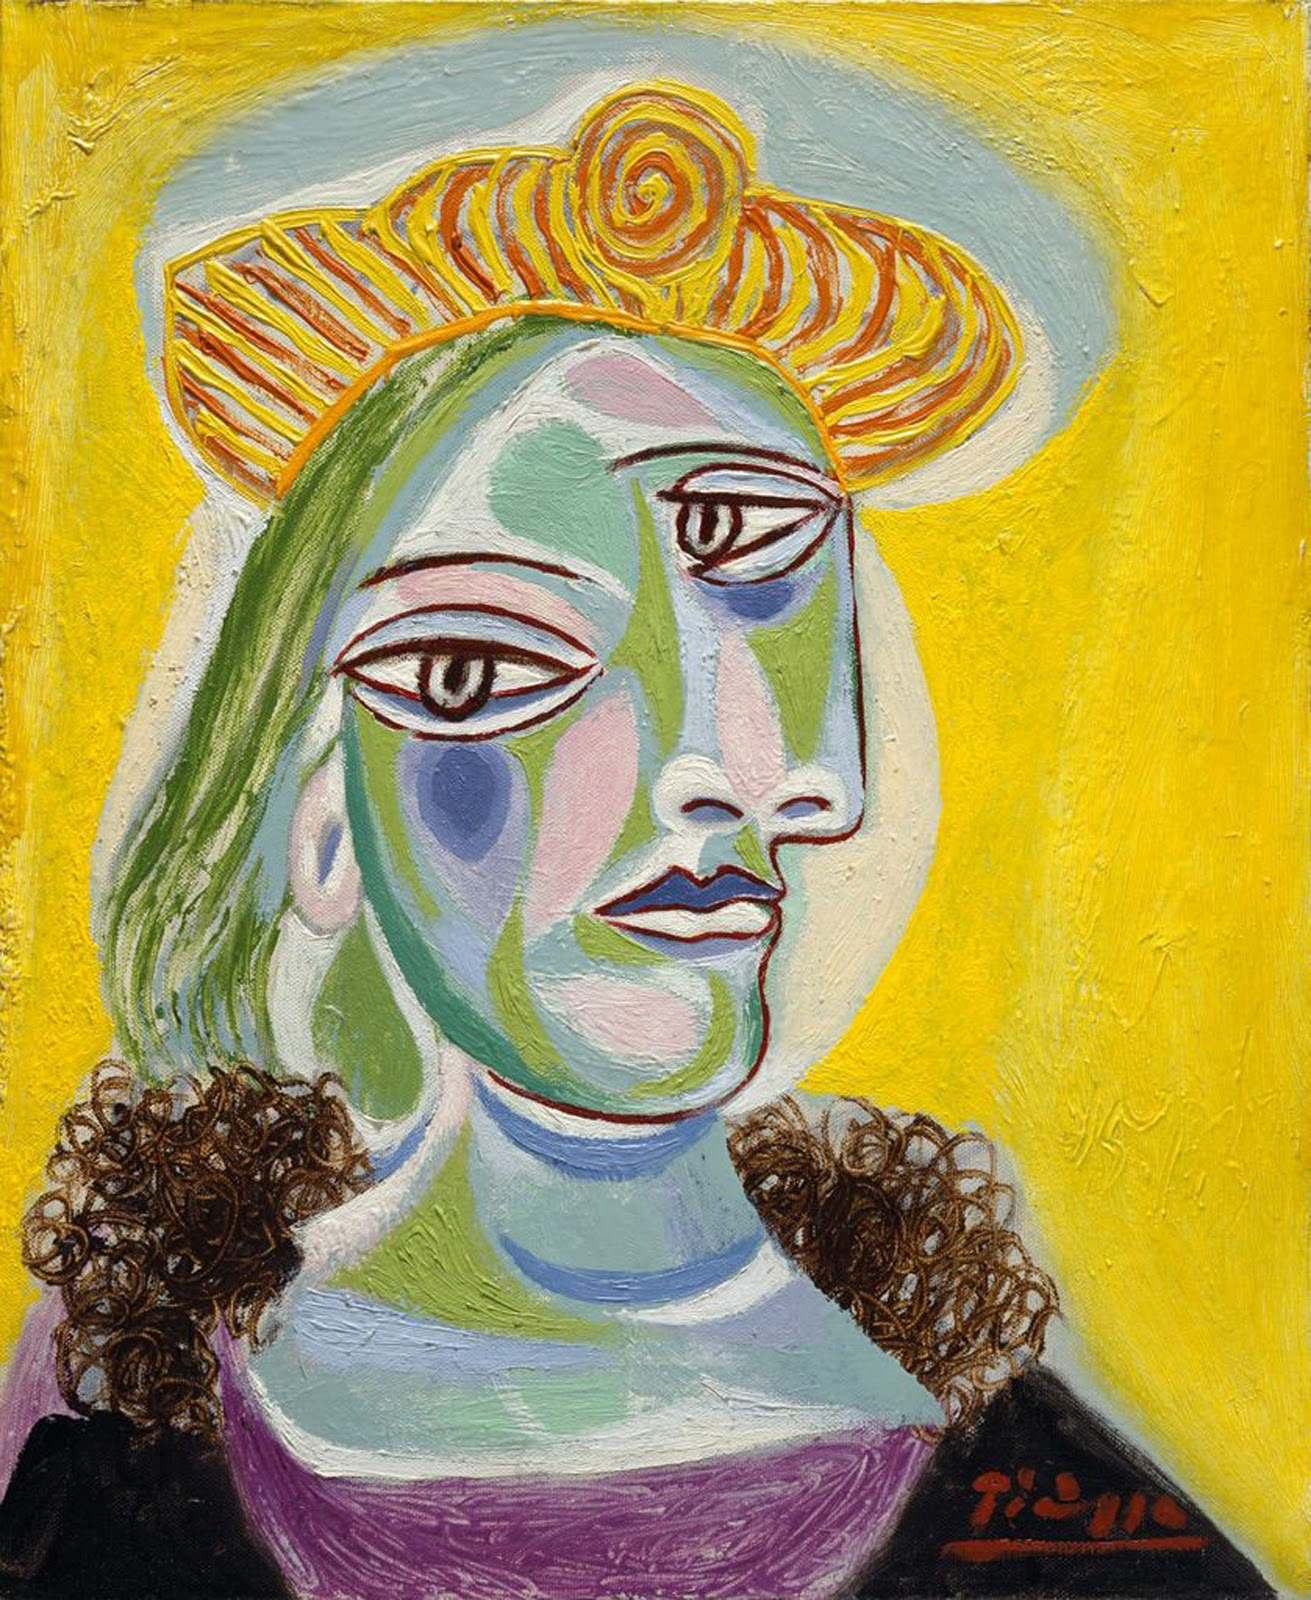 Dora Maar by Picasso, 1939